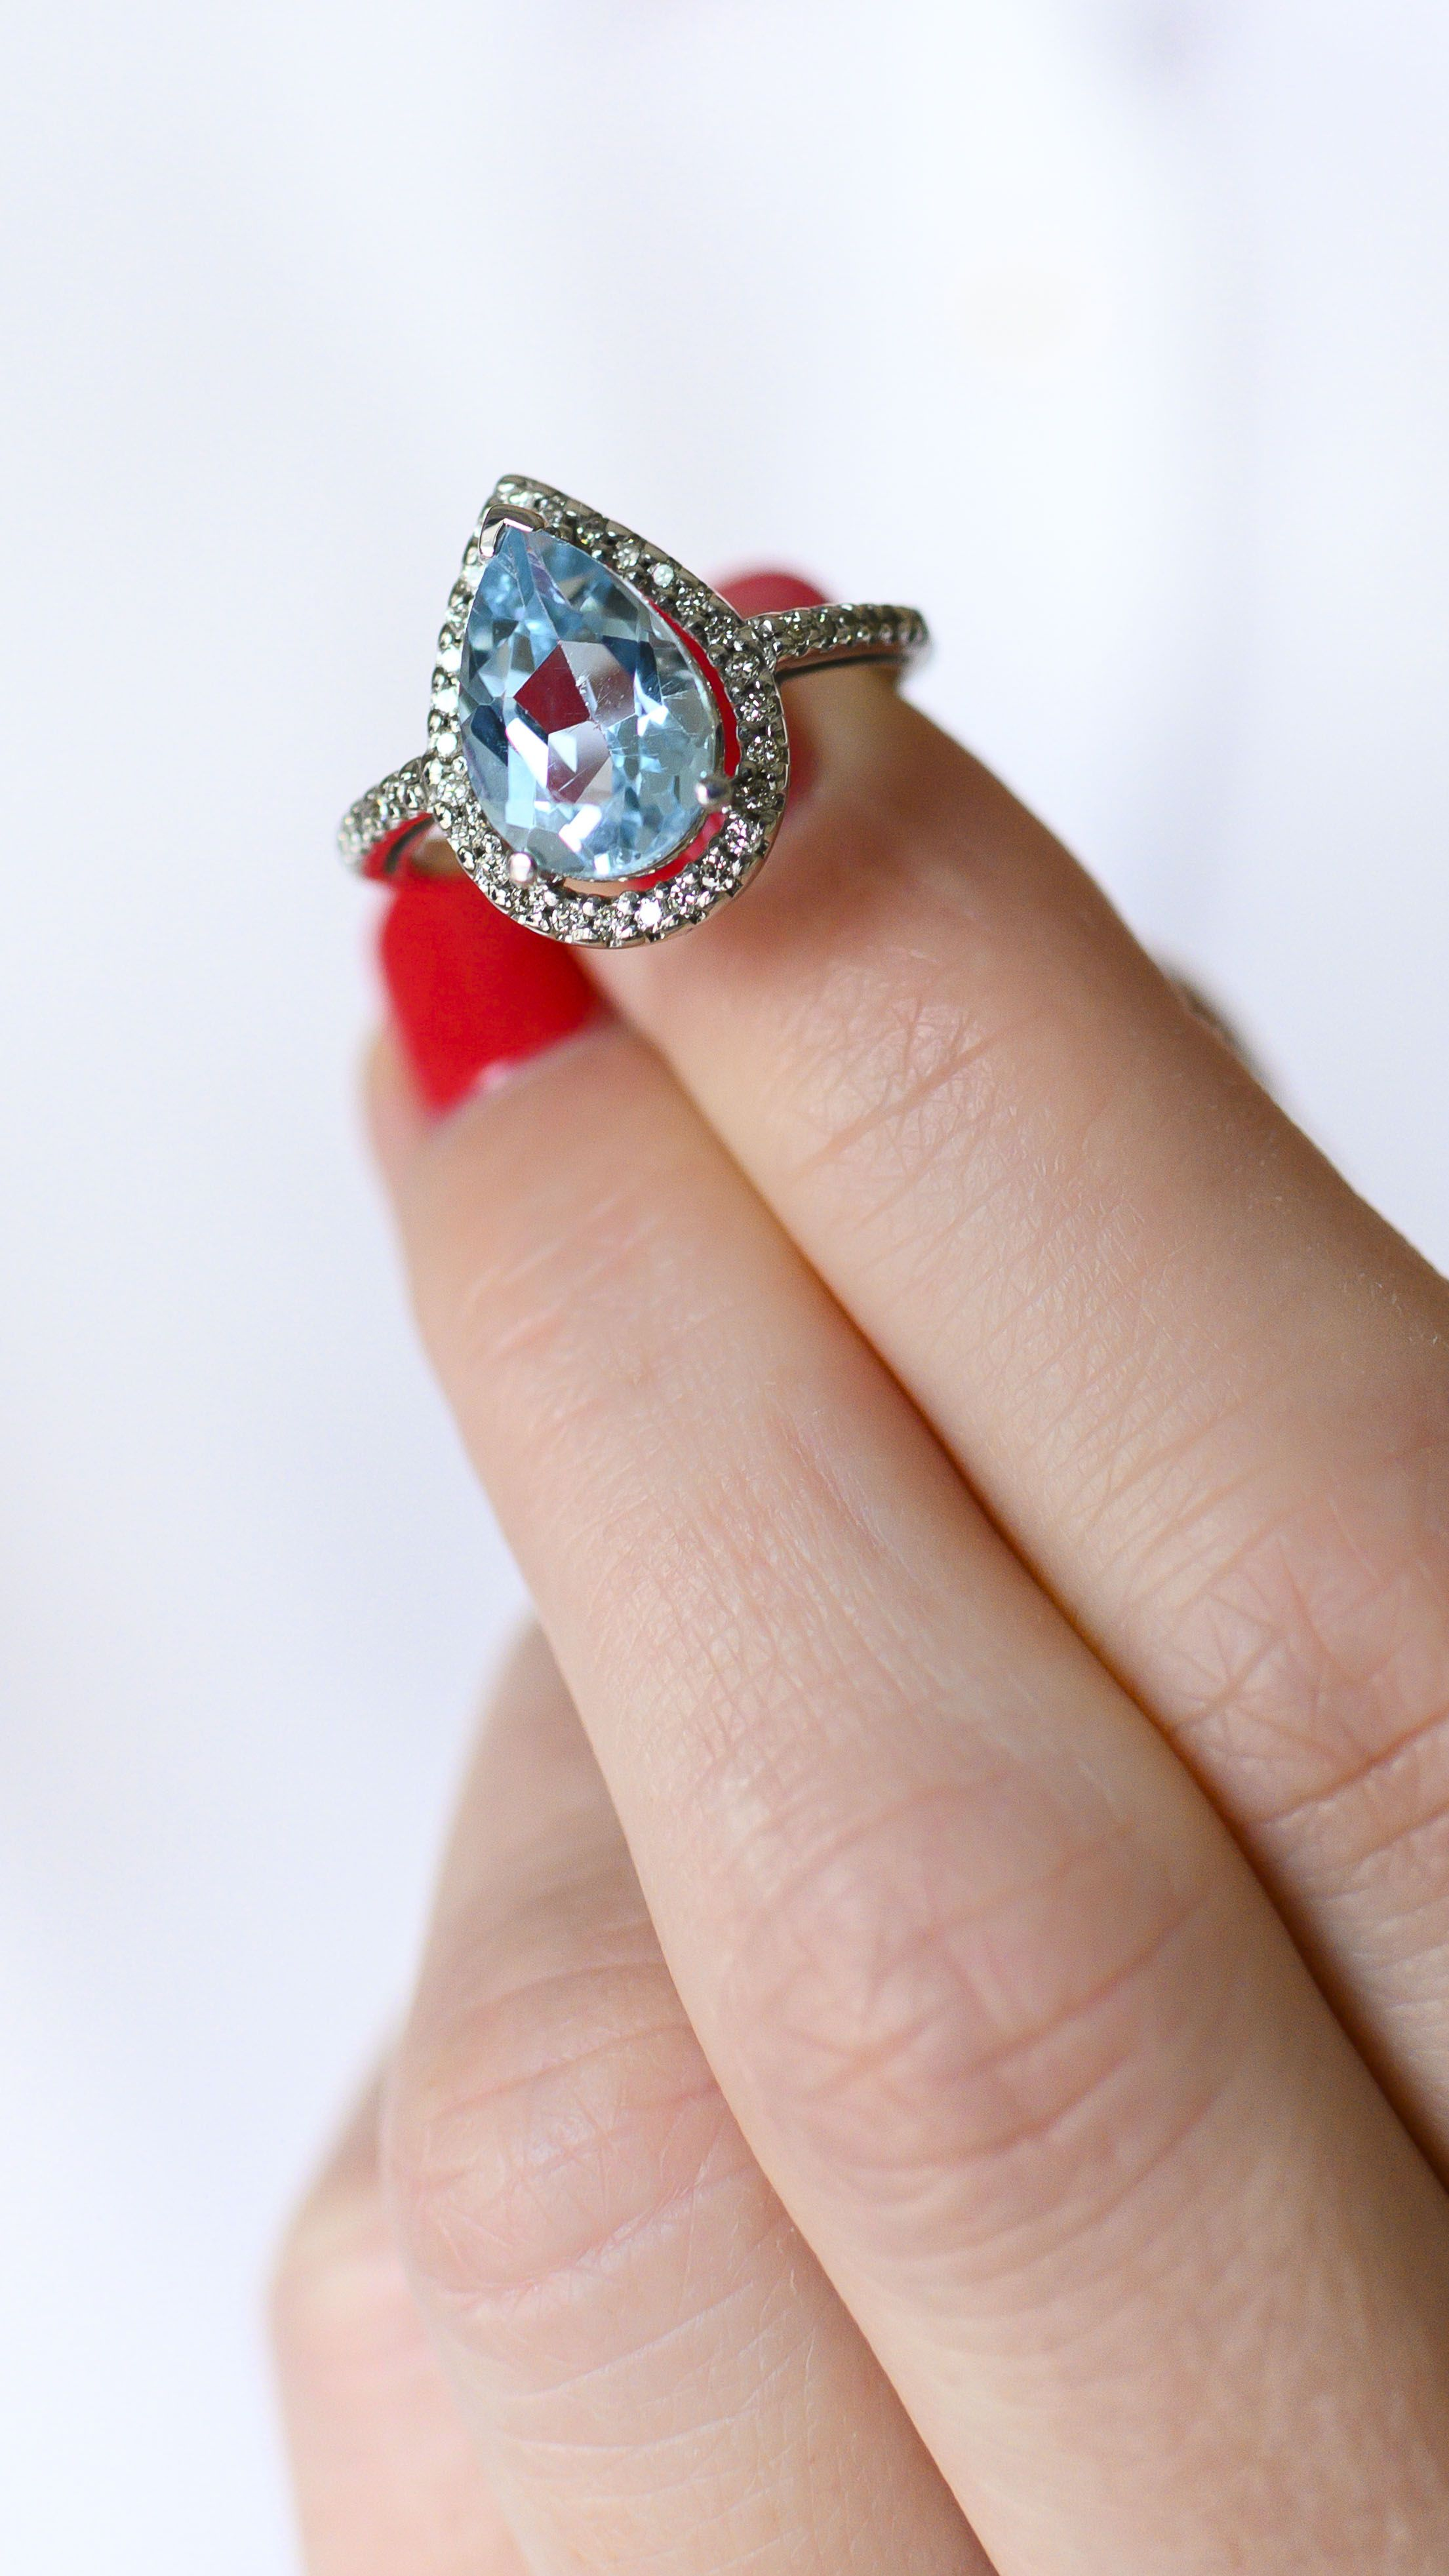 Verlobungsring Mal Anders Ring Verlobung Verlobungsring Ringe